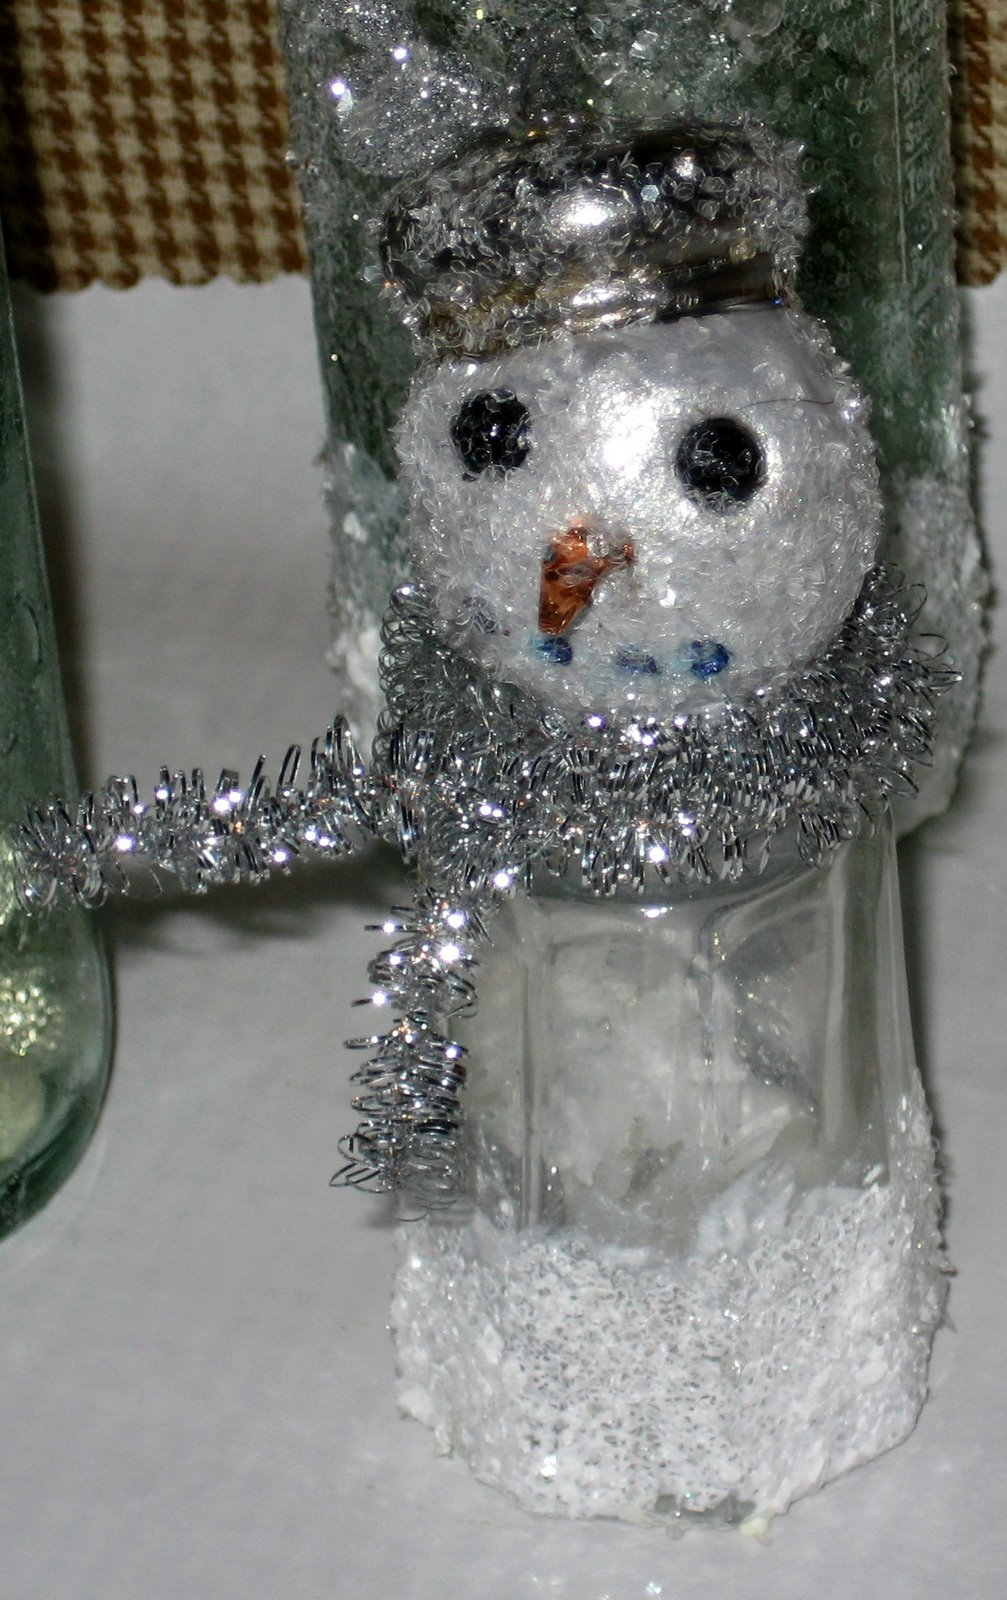 [salt+shaker+snowman.jpg]